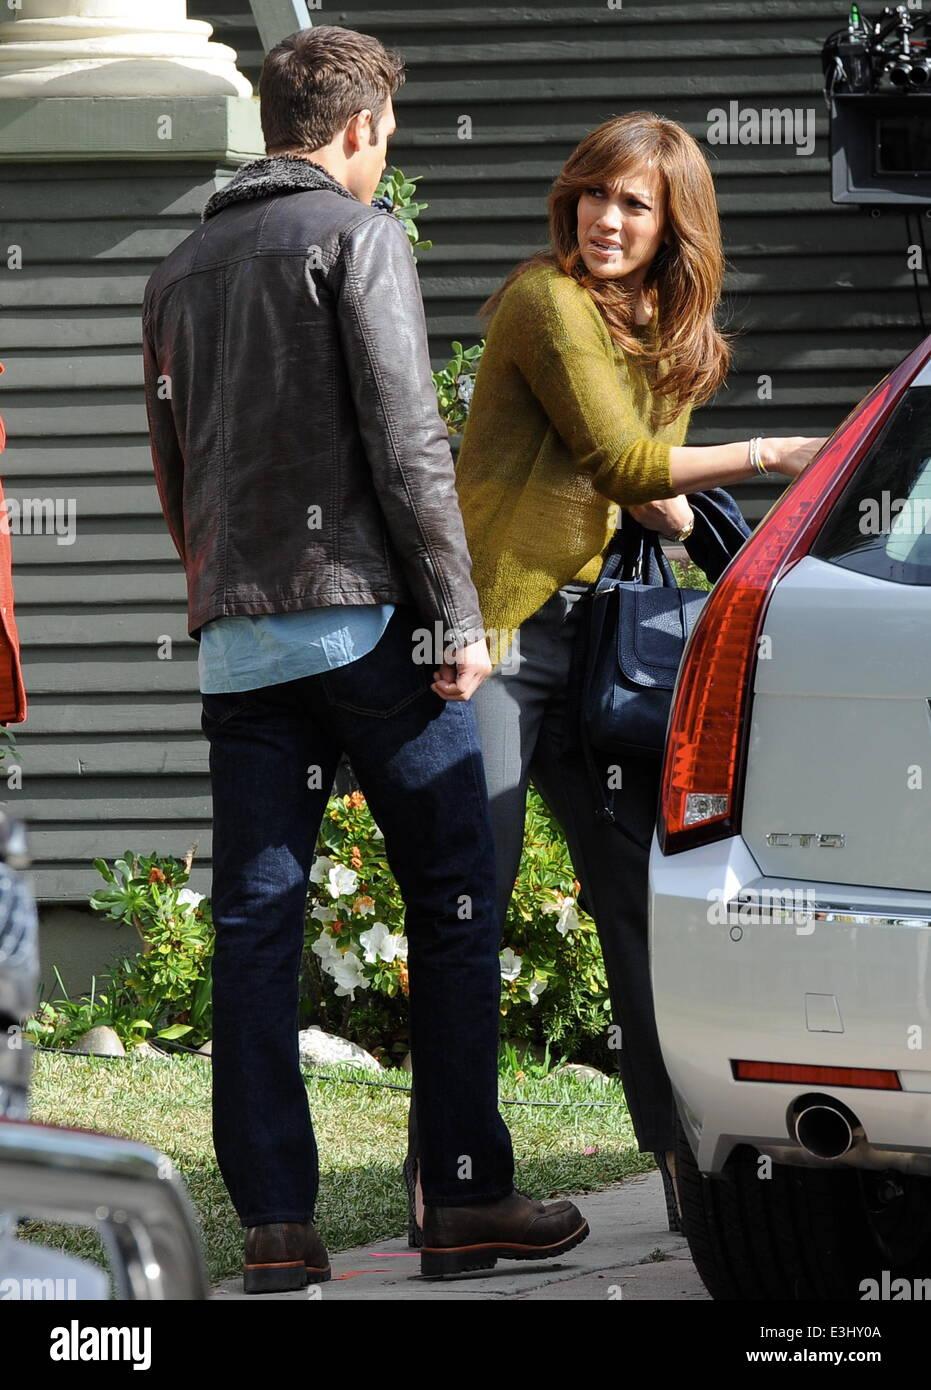 Jennifer Lopez filming scenes for her new movie \u0027The Boy Next Door\u0027 with co stars John Corbett and Ryan Guzman in Hollywood Featuring: Jennifer LopezRyan ...